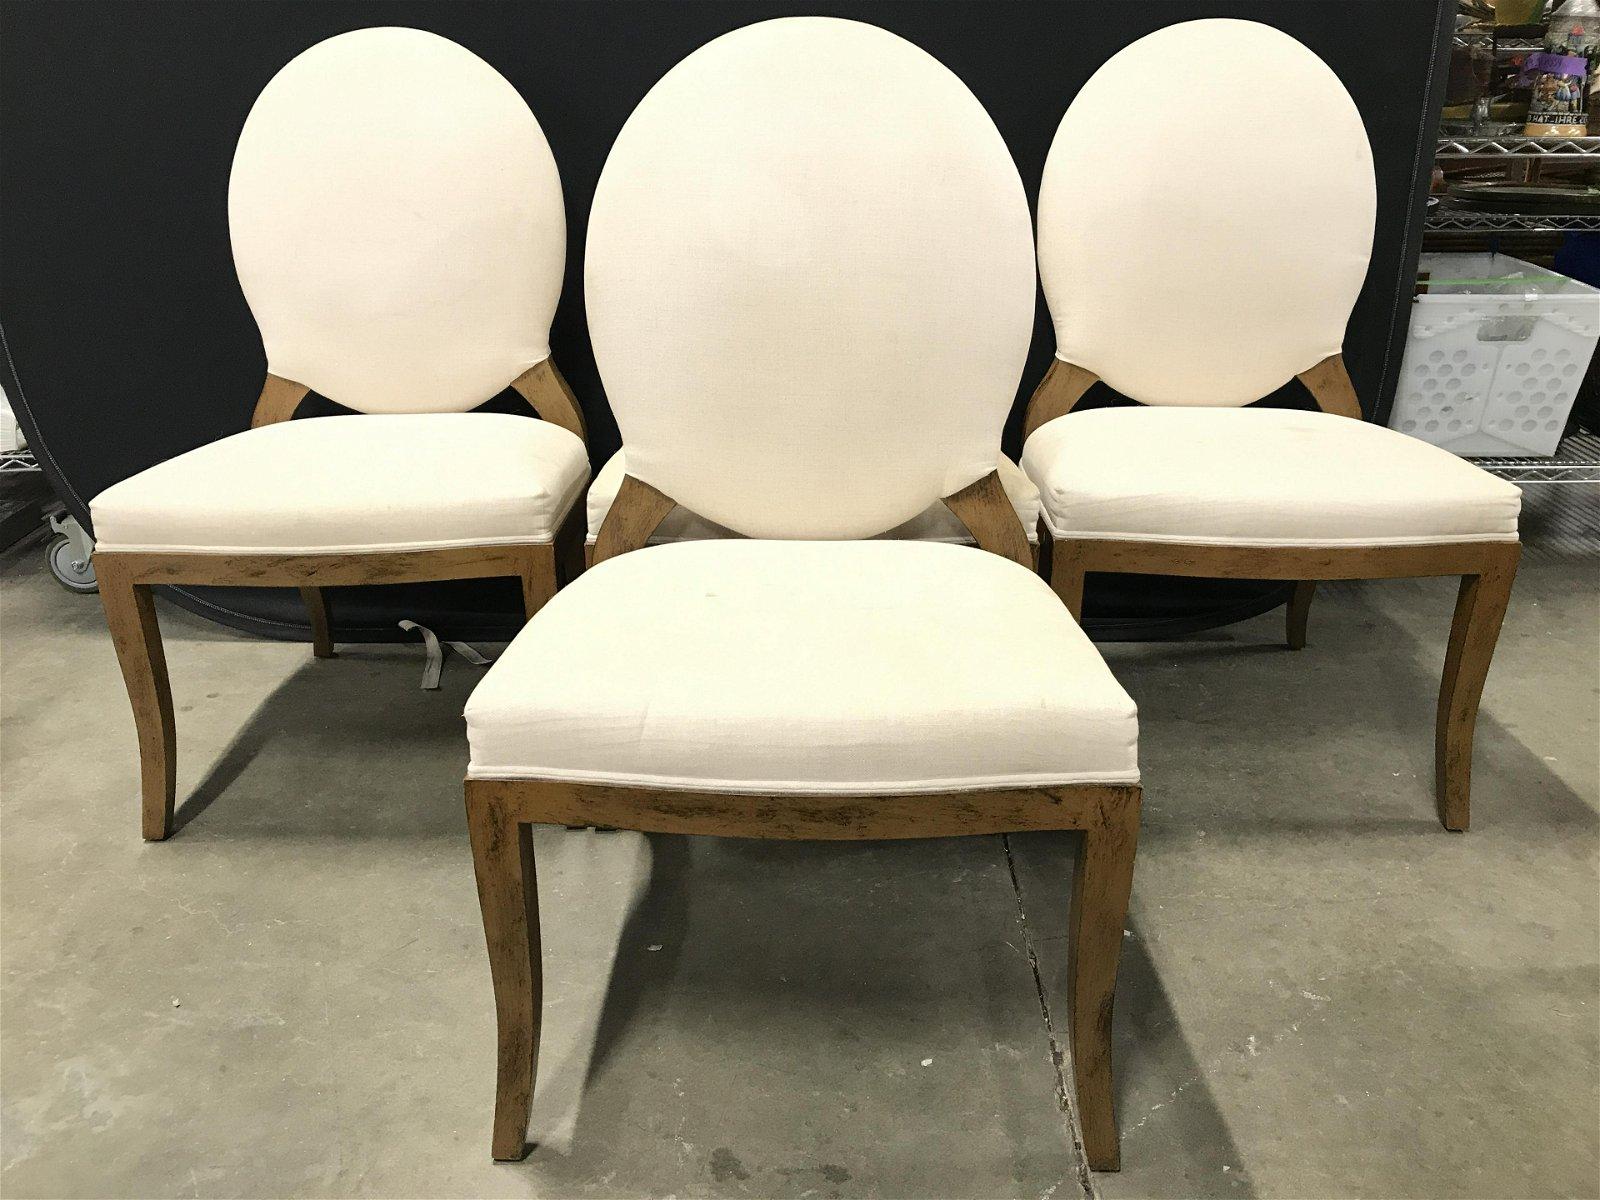 Set 4 Vintage Upholstered Side Chairs